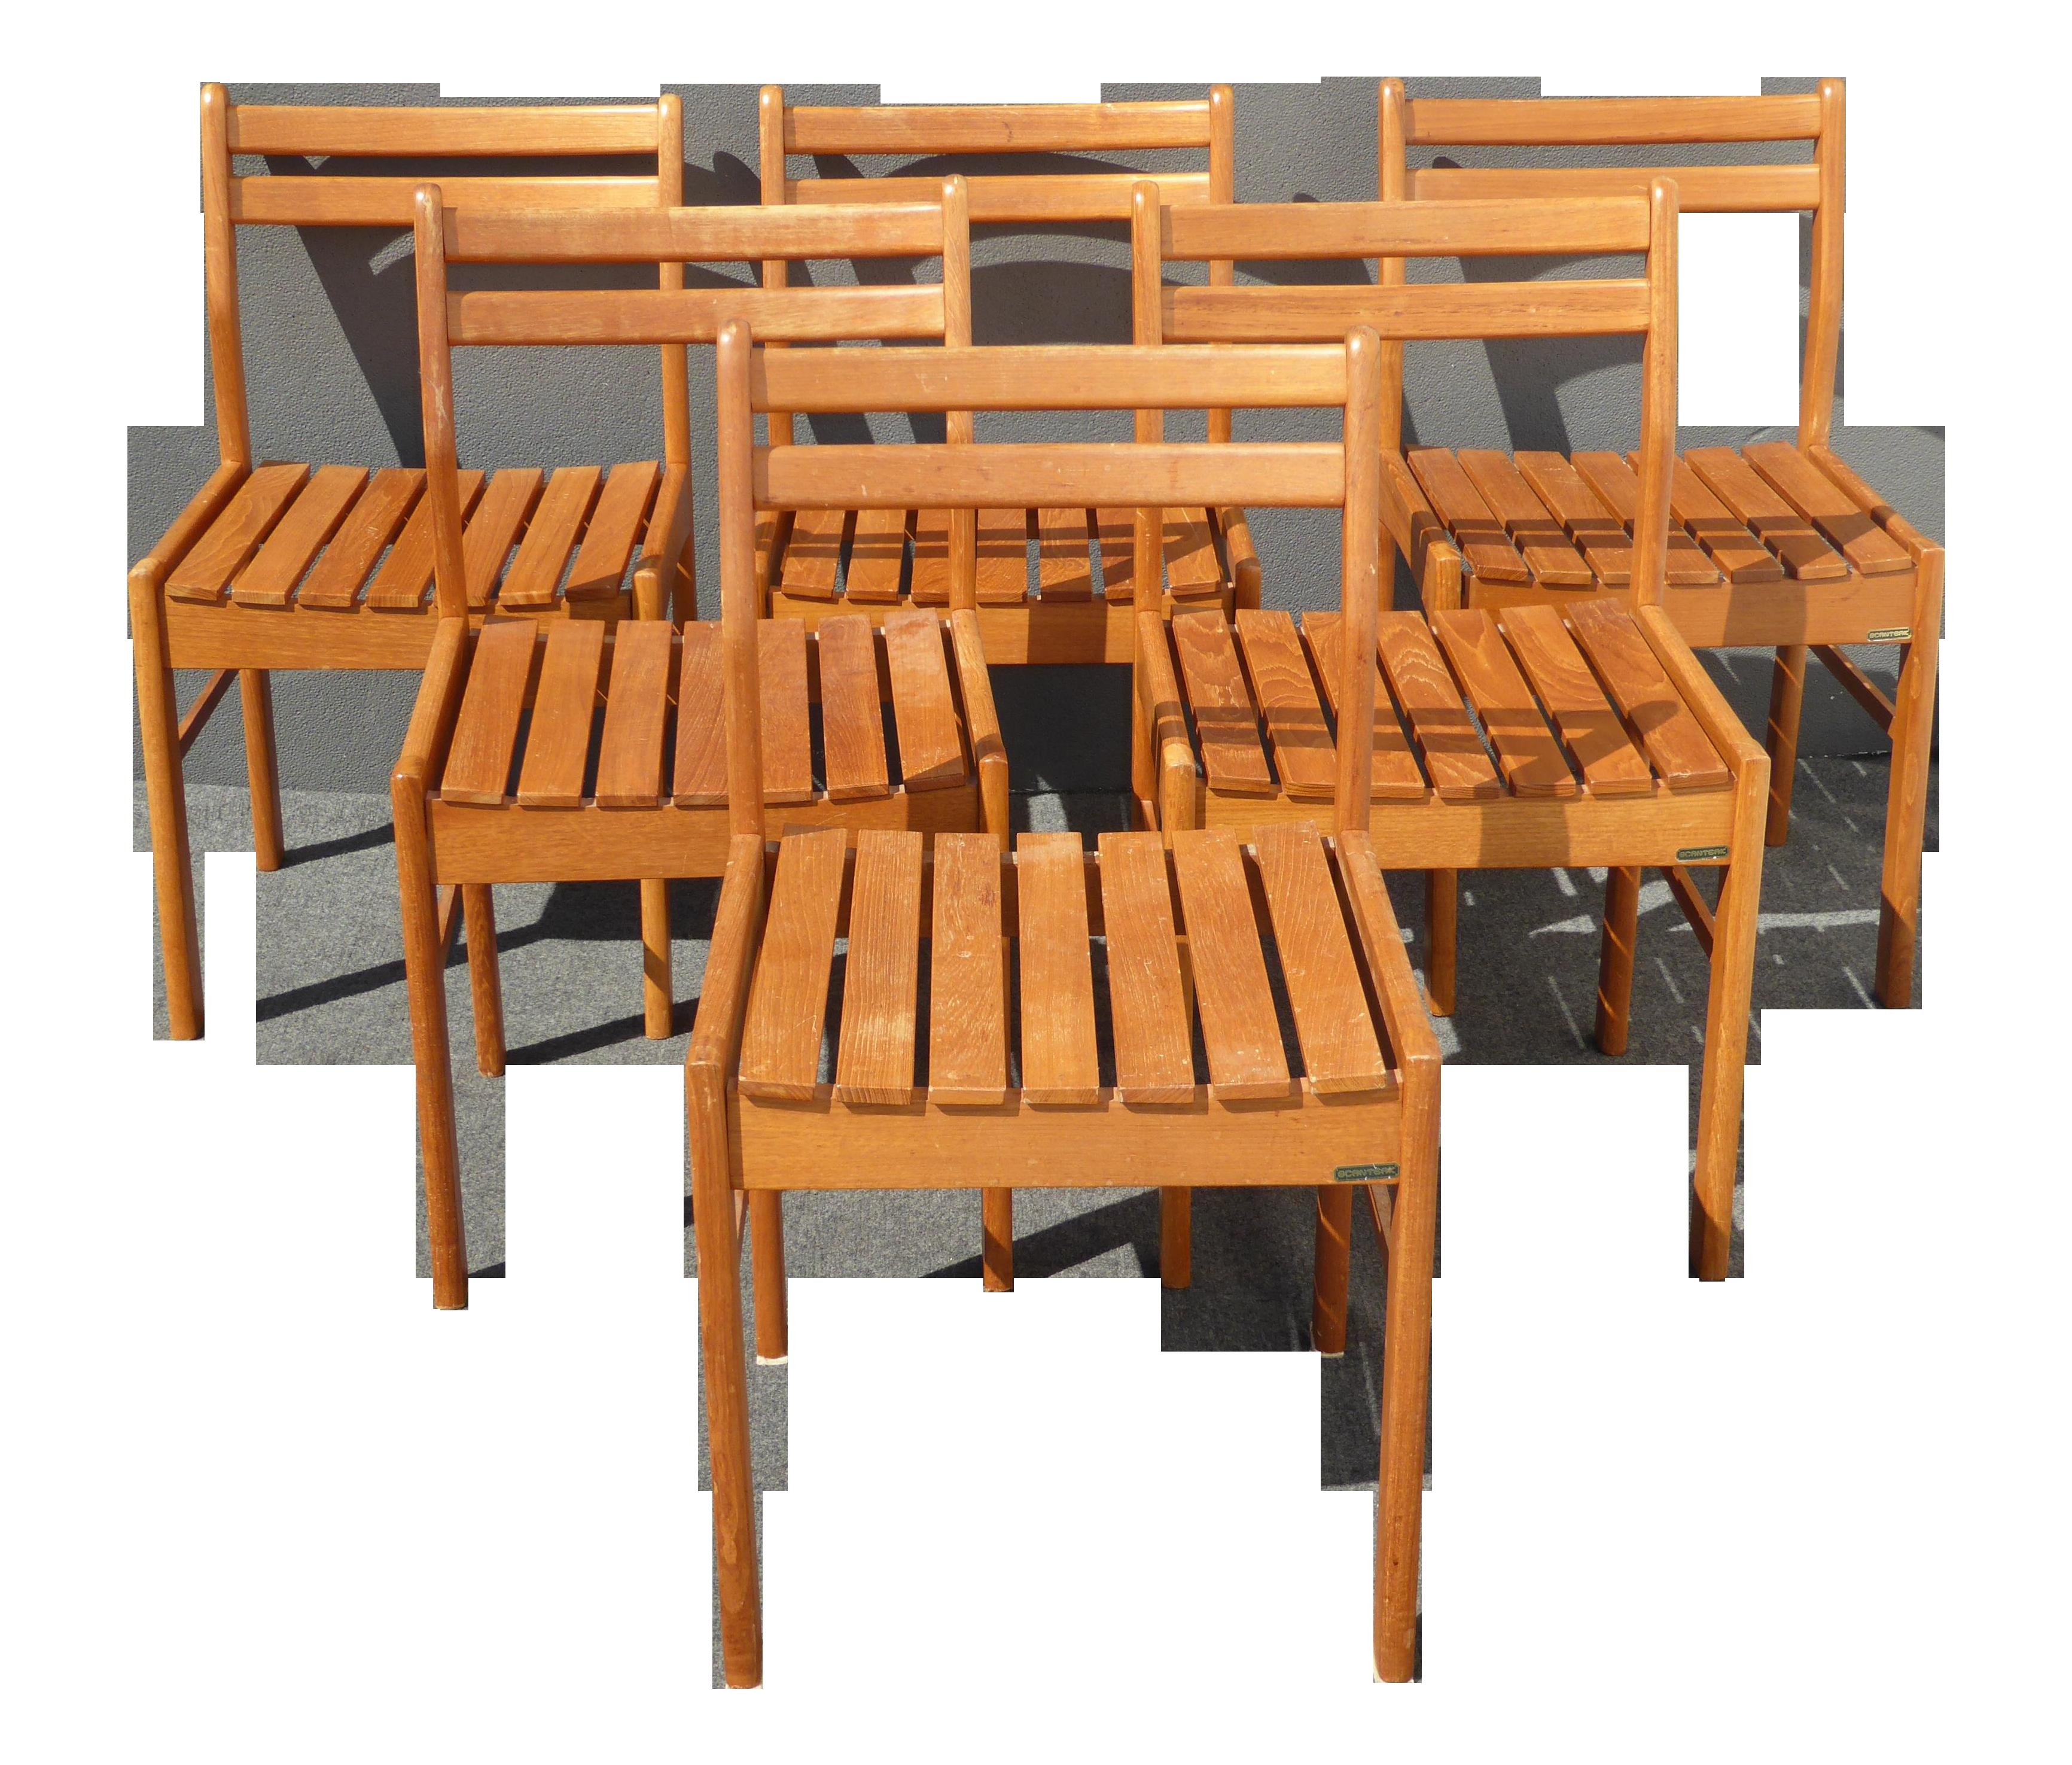 Danish Modern ScanTeak Outdoor Chairs Set Of 6 Chairish